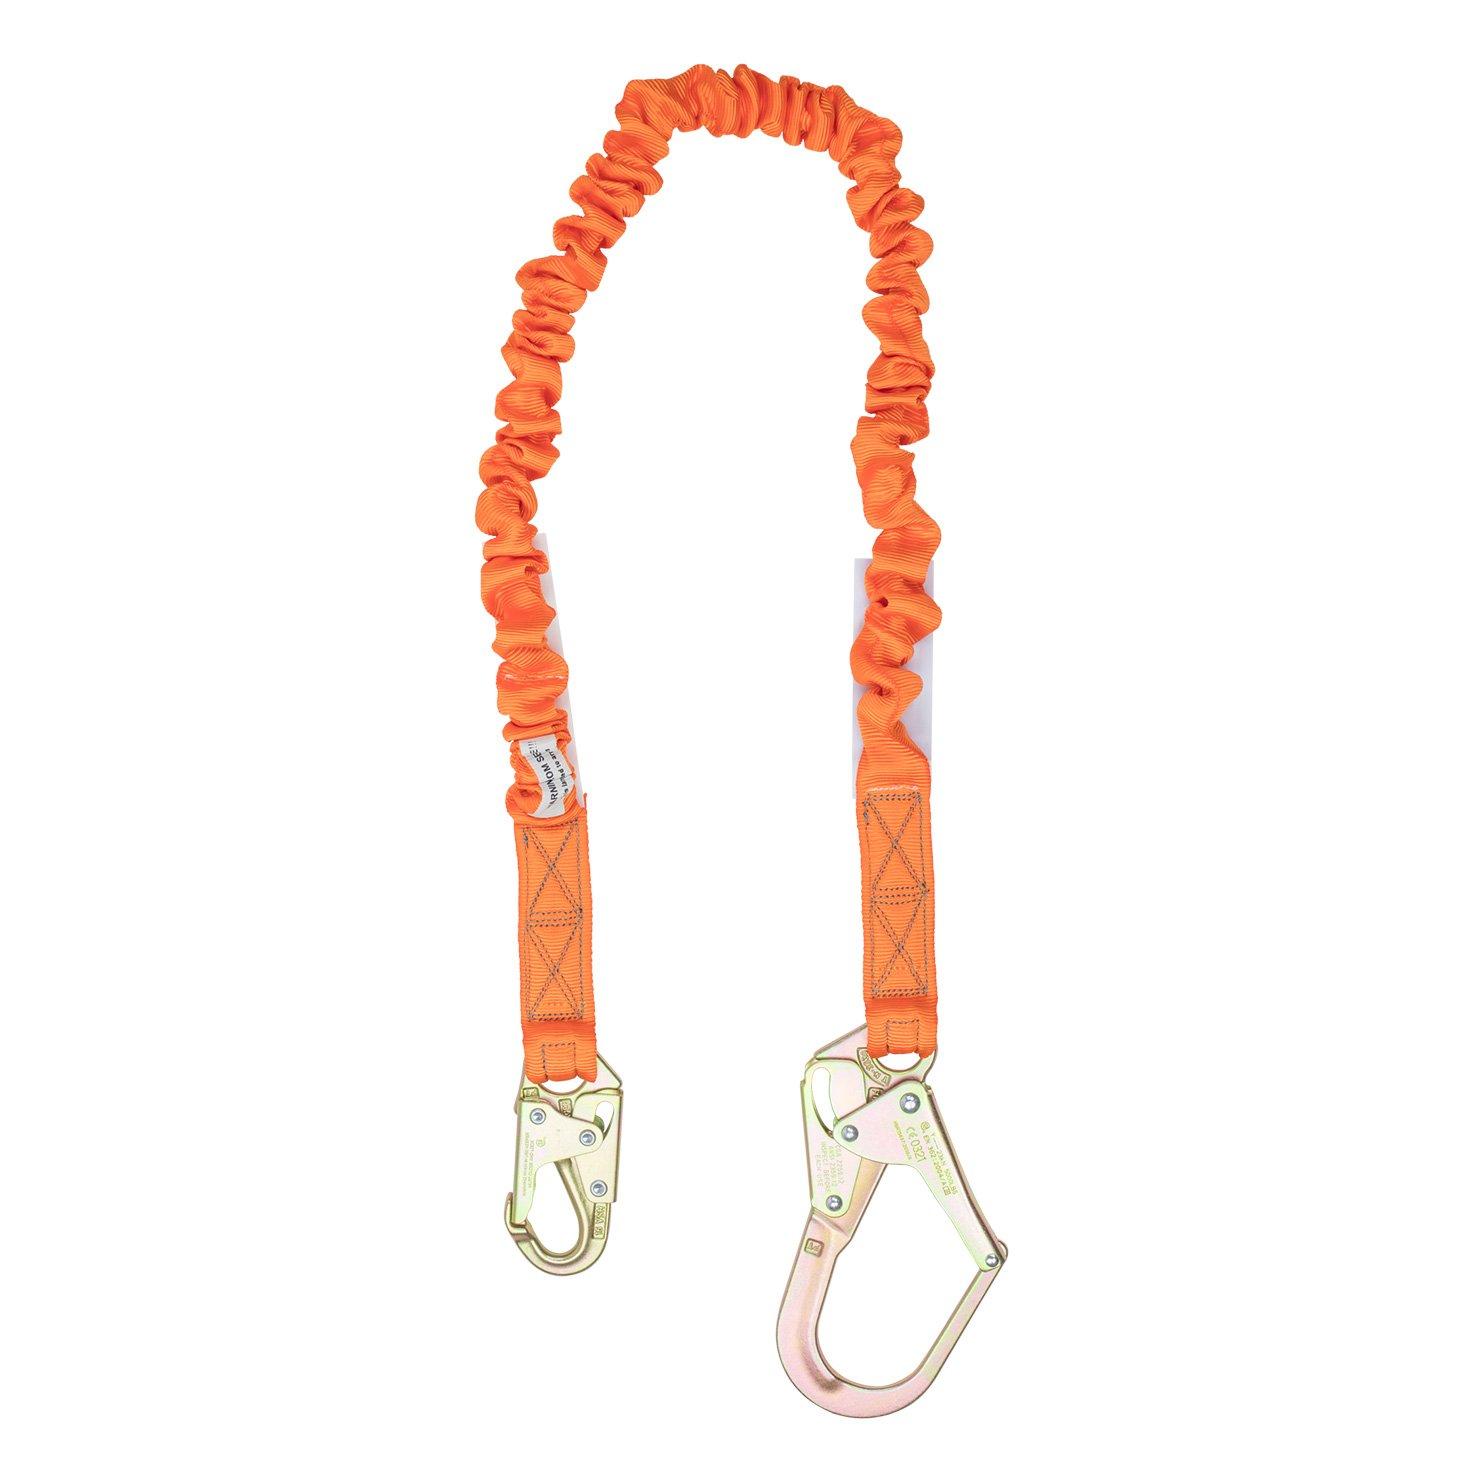 4.5-6 Foot Single Leg Stretch Internal Shock Absorbing Lanyard with 1 Rebar Hook and 1 Steel Snap Hook